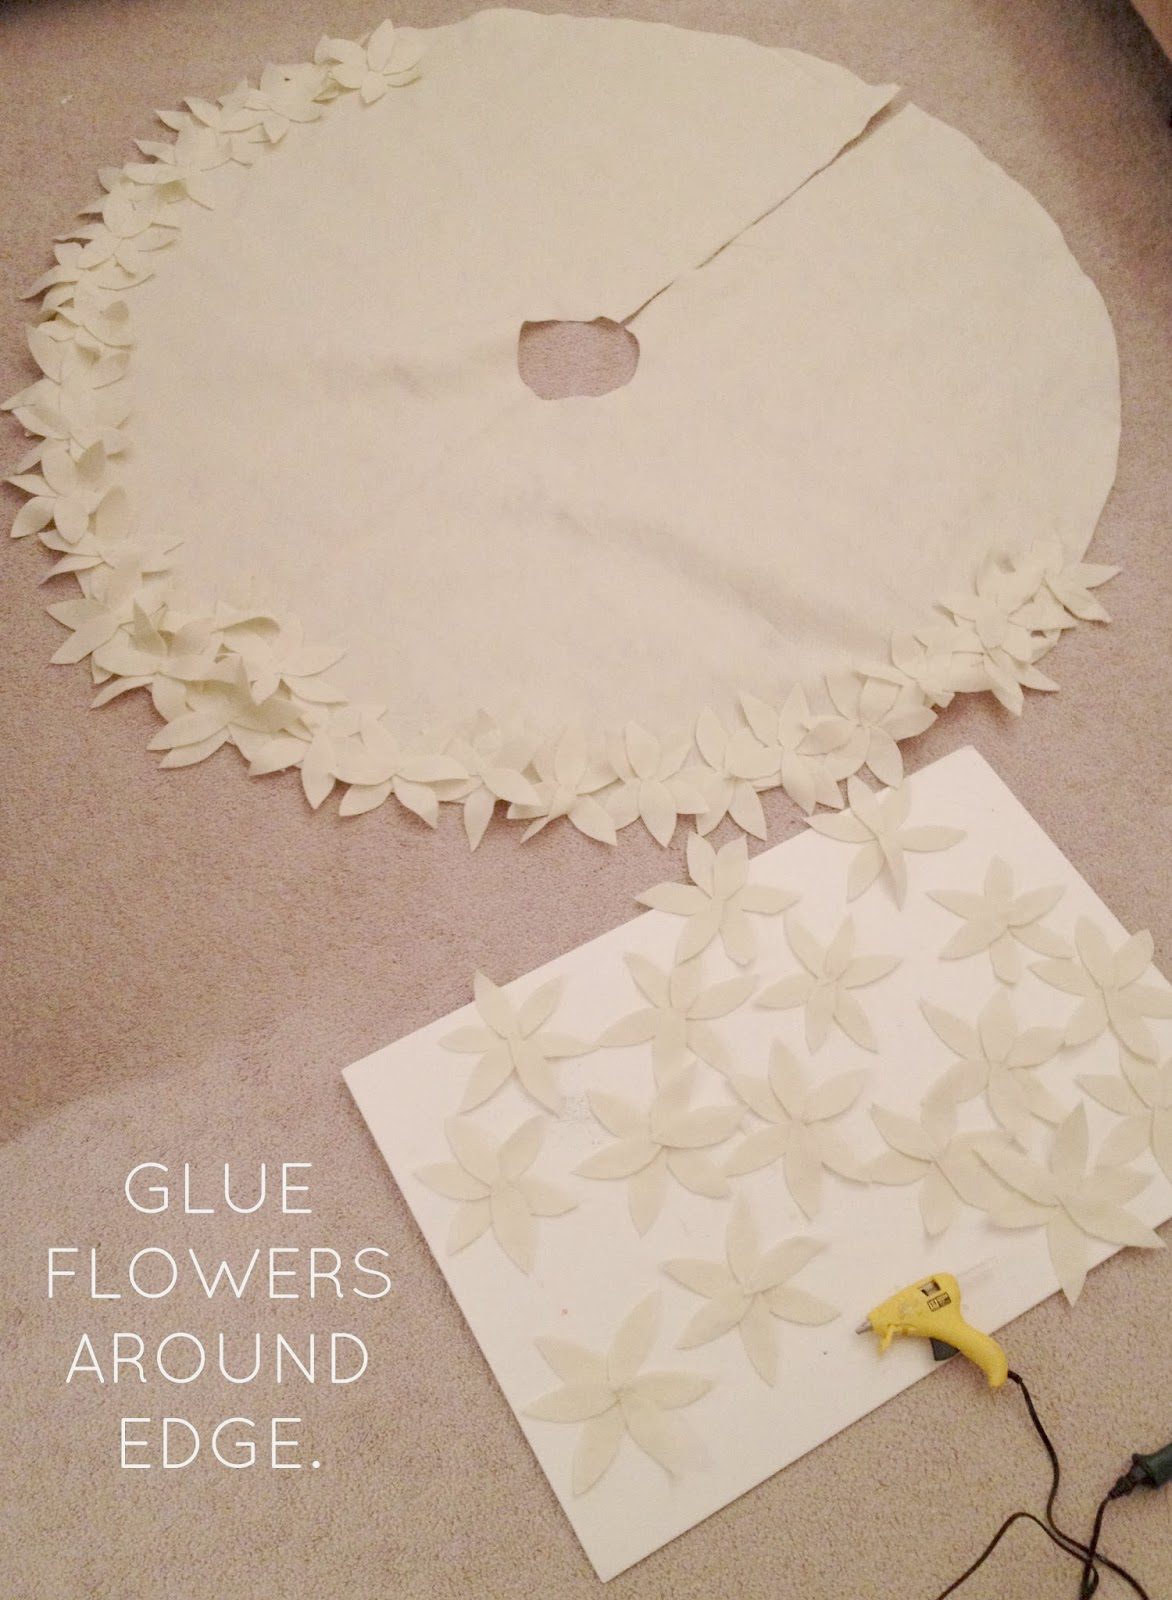 How To Make A NO SEW Christmas Tree Skirt LiveLoveDIY Bloglovin' - Make A Christmas Tree Skirt